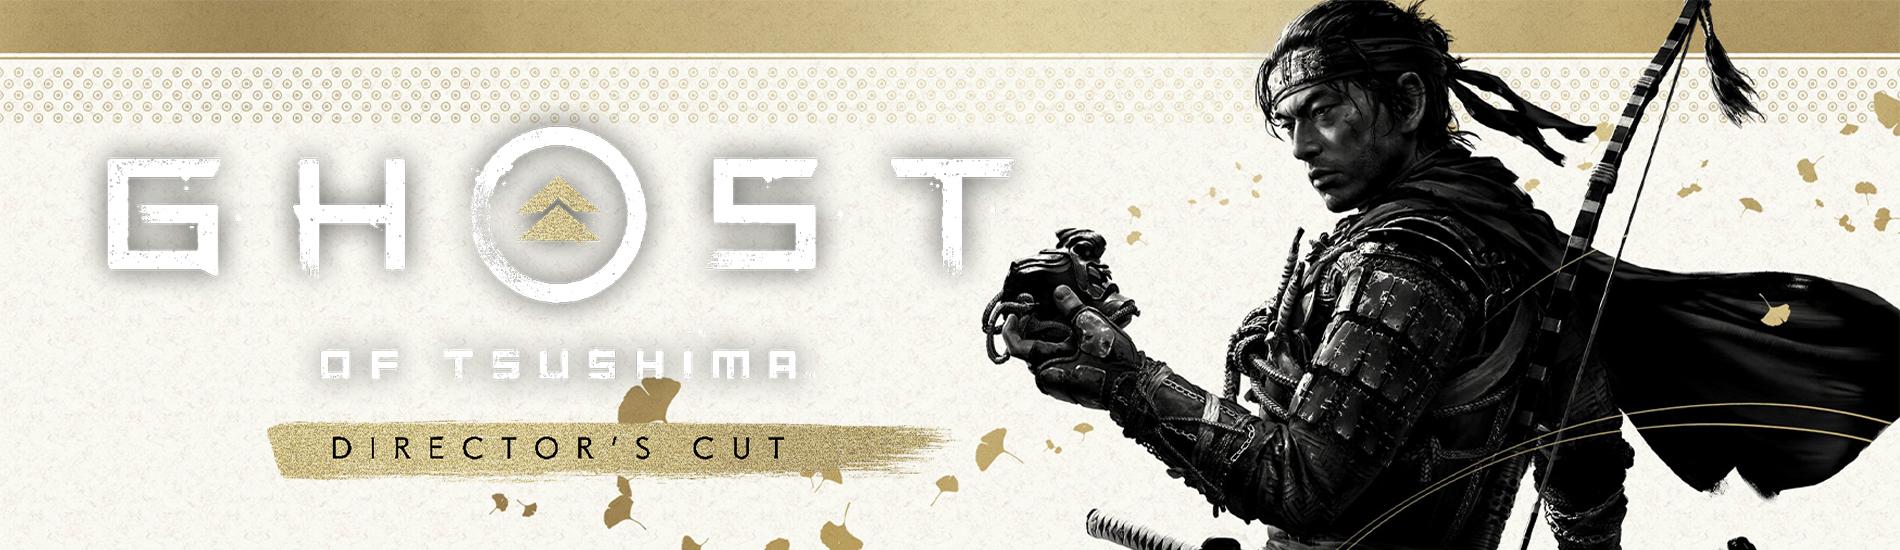 Sony Ghostoftsushima Directorscut 08.10.banner